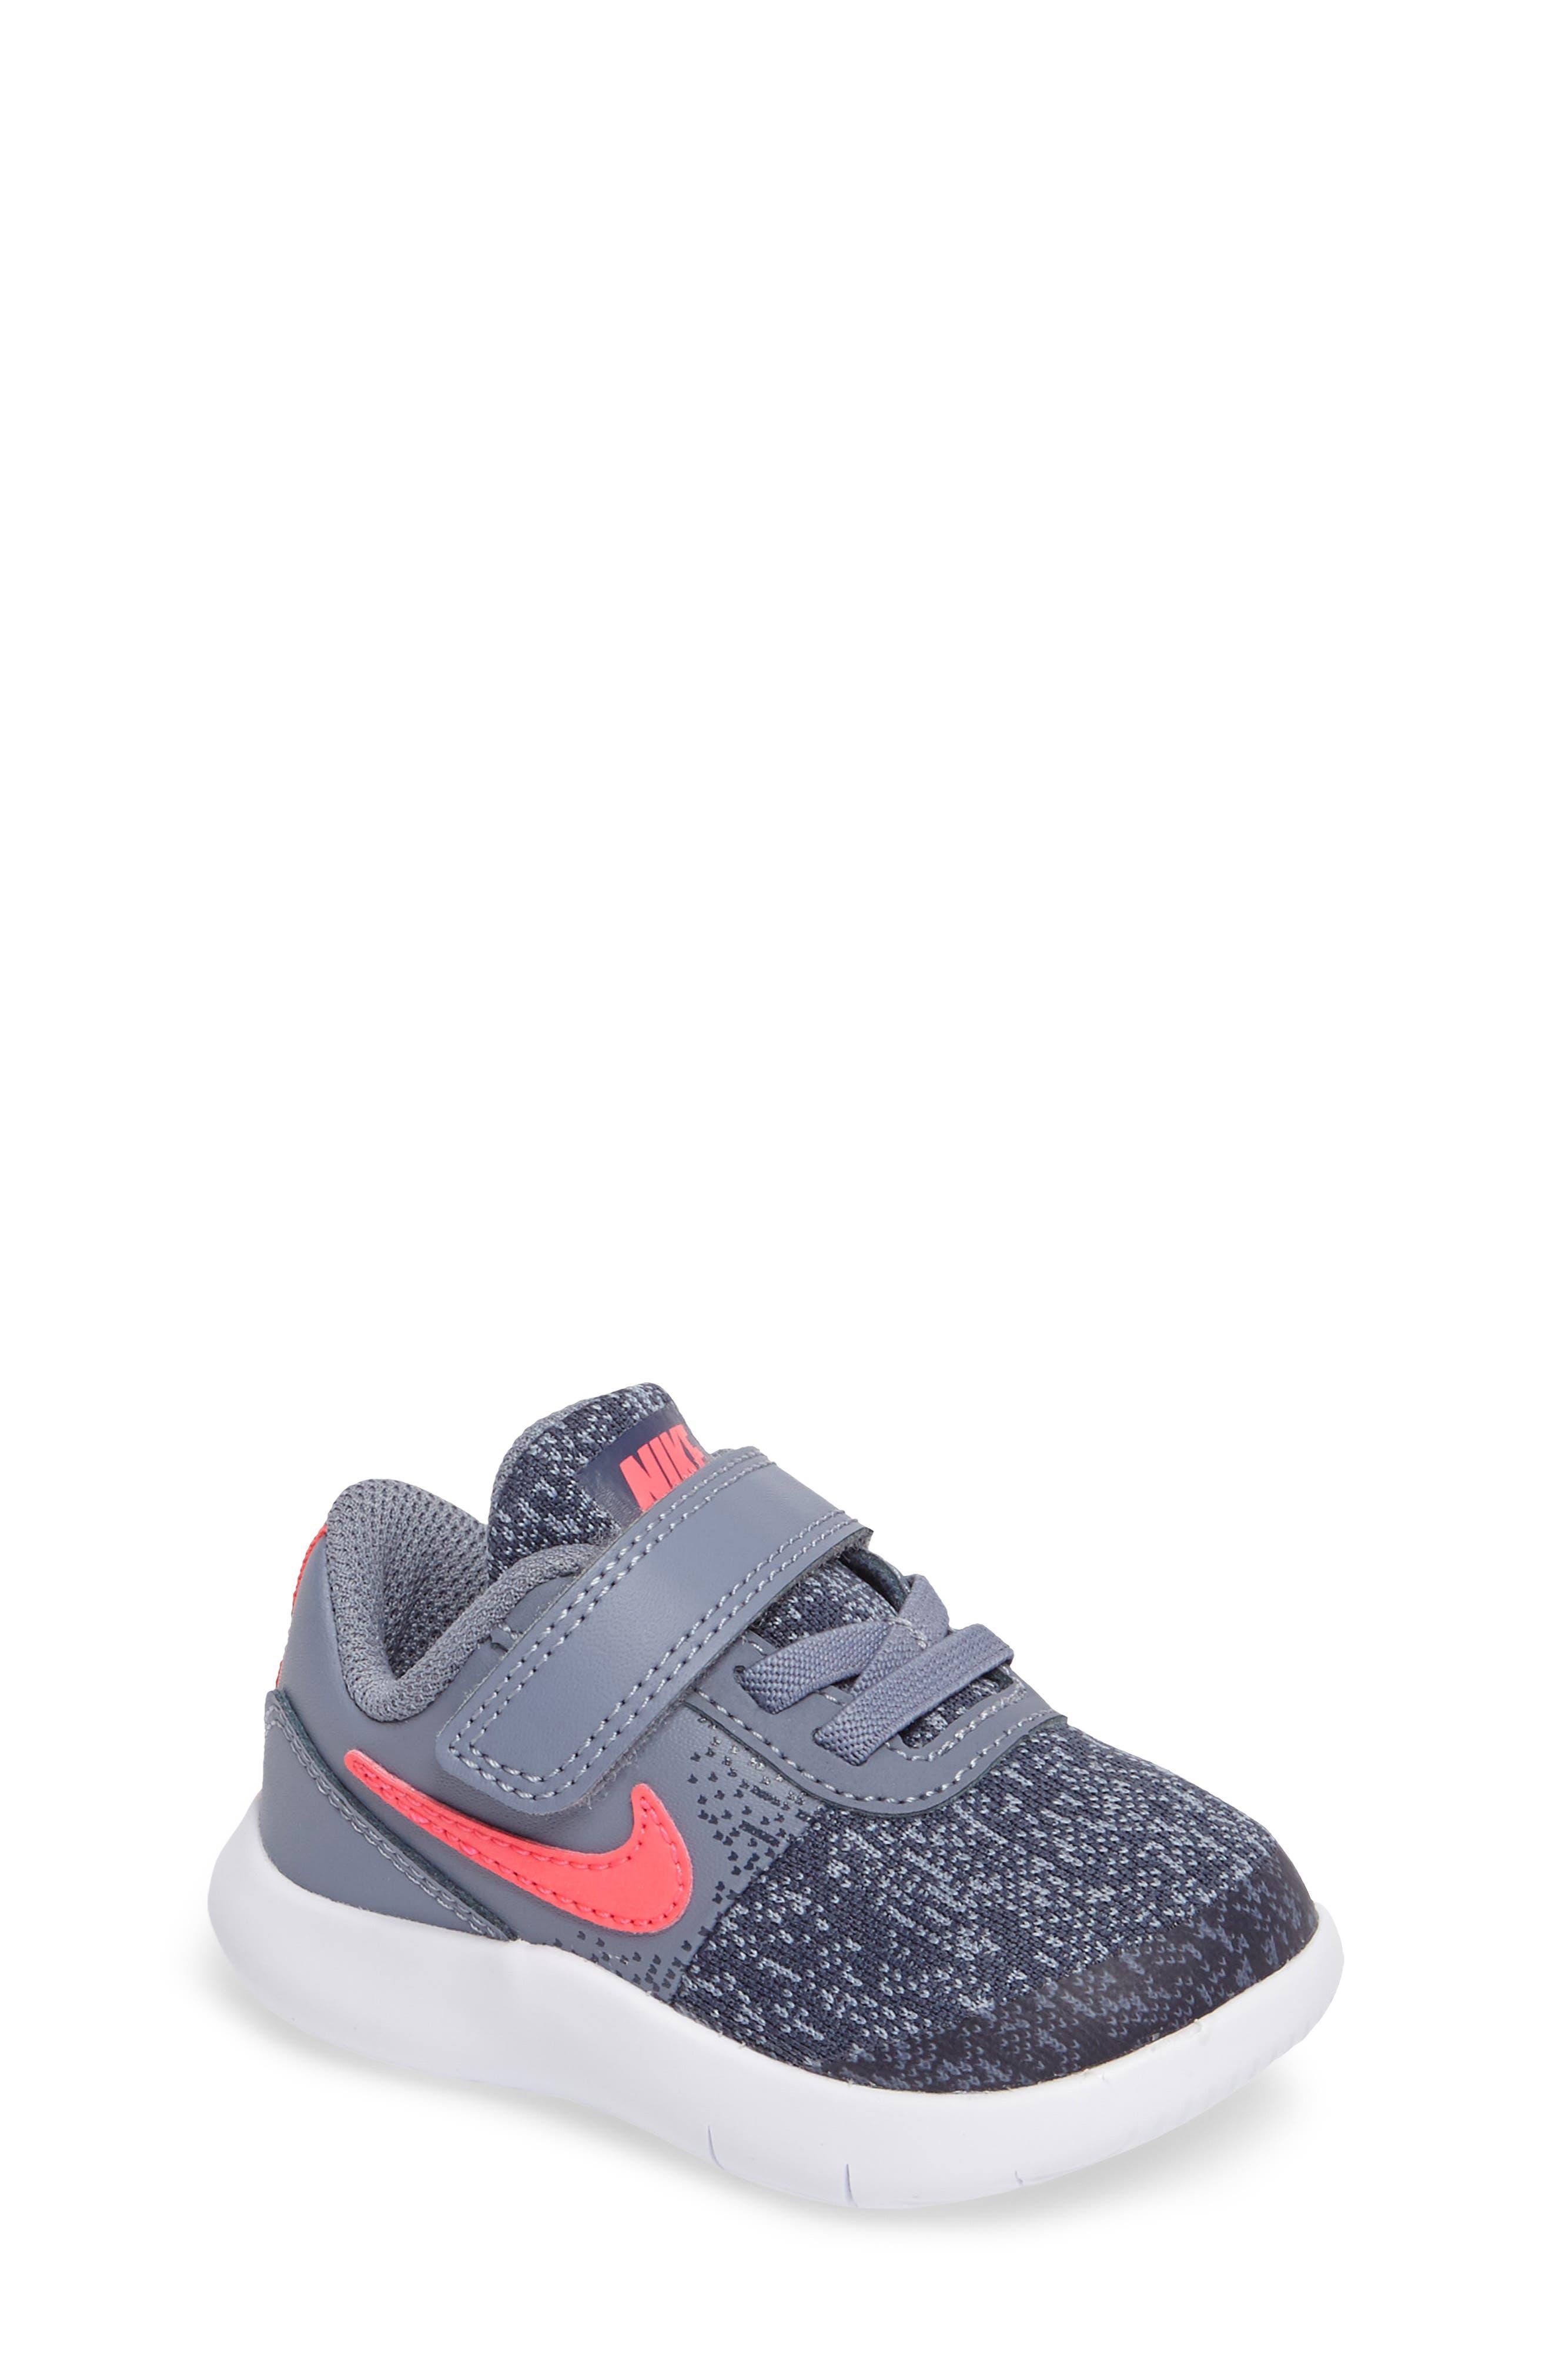 Flex Contact Sneaker,                         Main,                         color, Racer Pink/ Thunder Blue